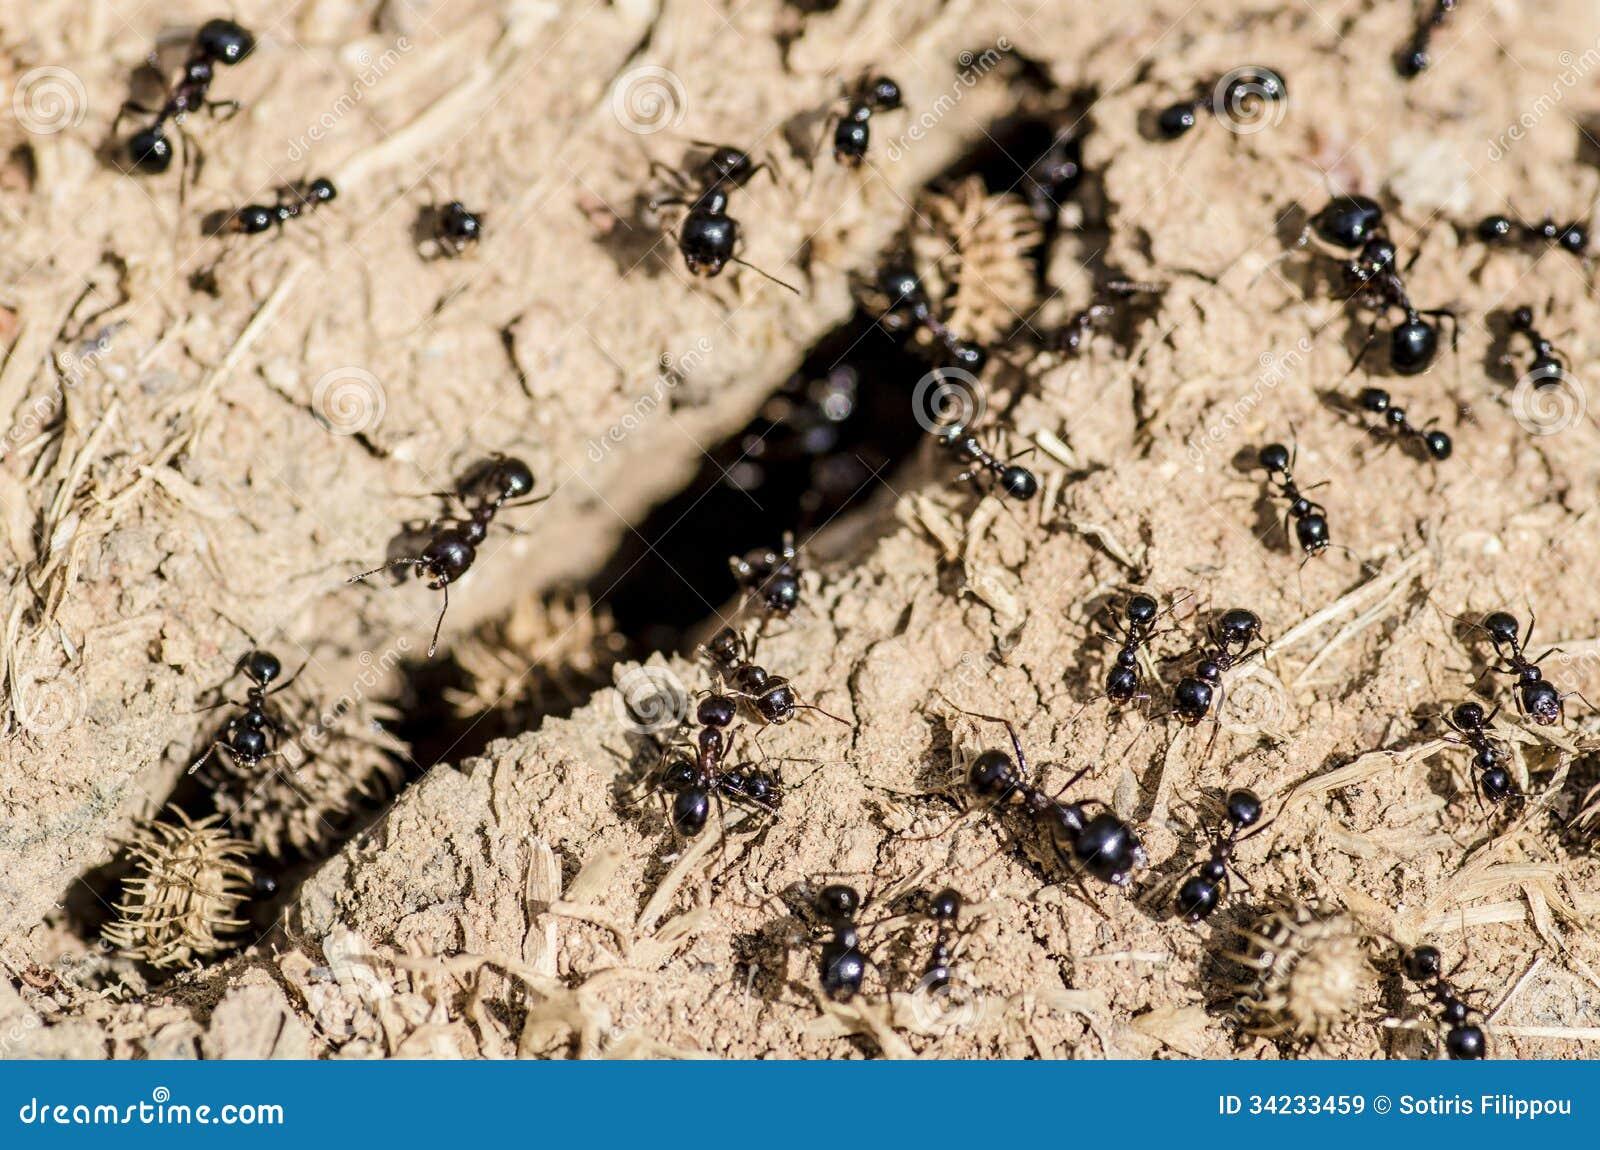 ants eat food on wall stock image 90816991. Black Bedroom Furniture Sets. Home Design Ideas